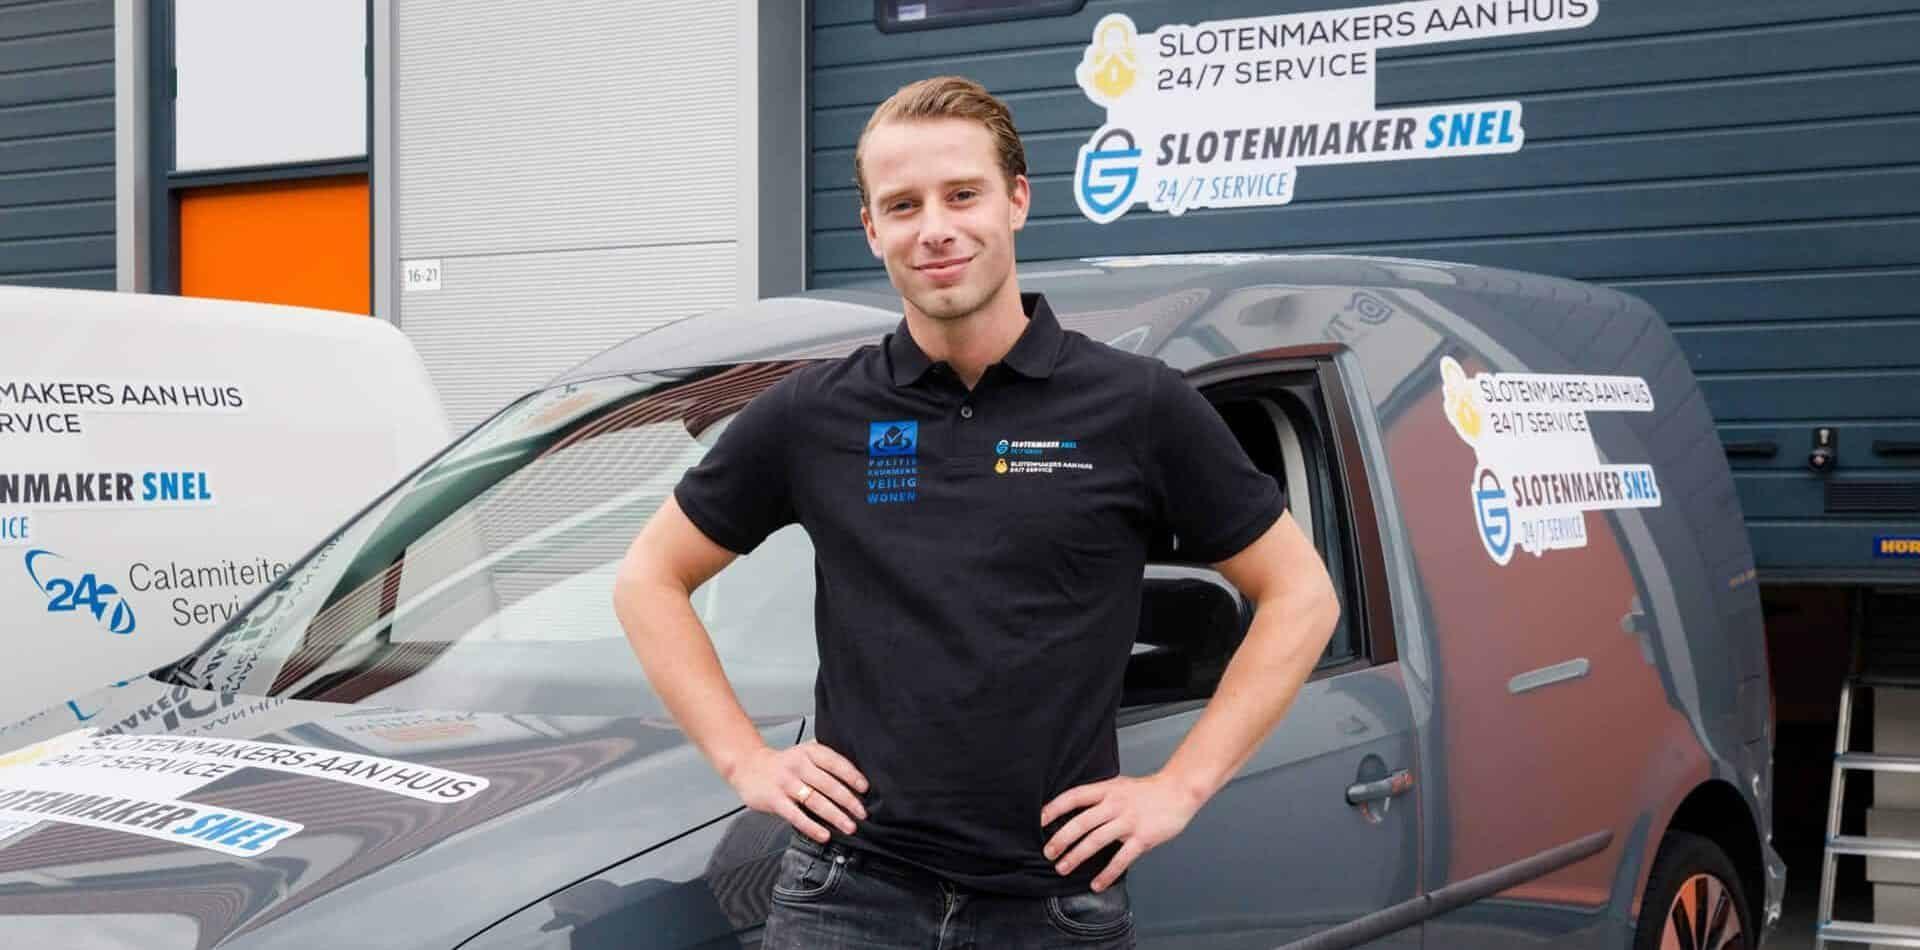 Slotenmaker Biddinghuizen